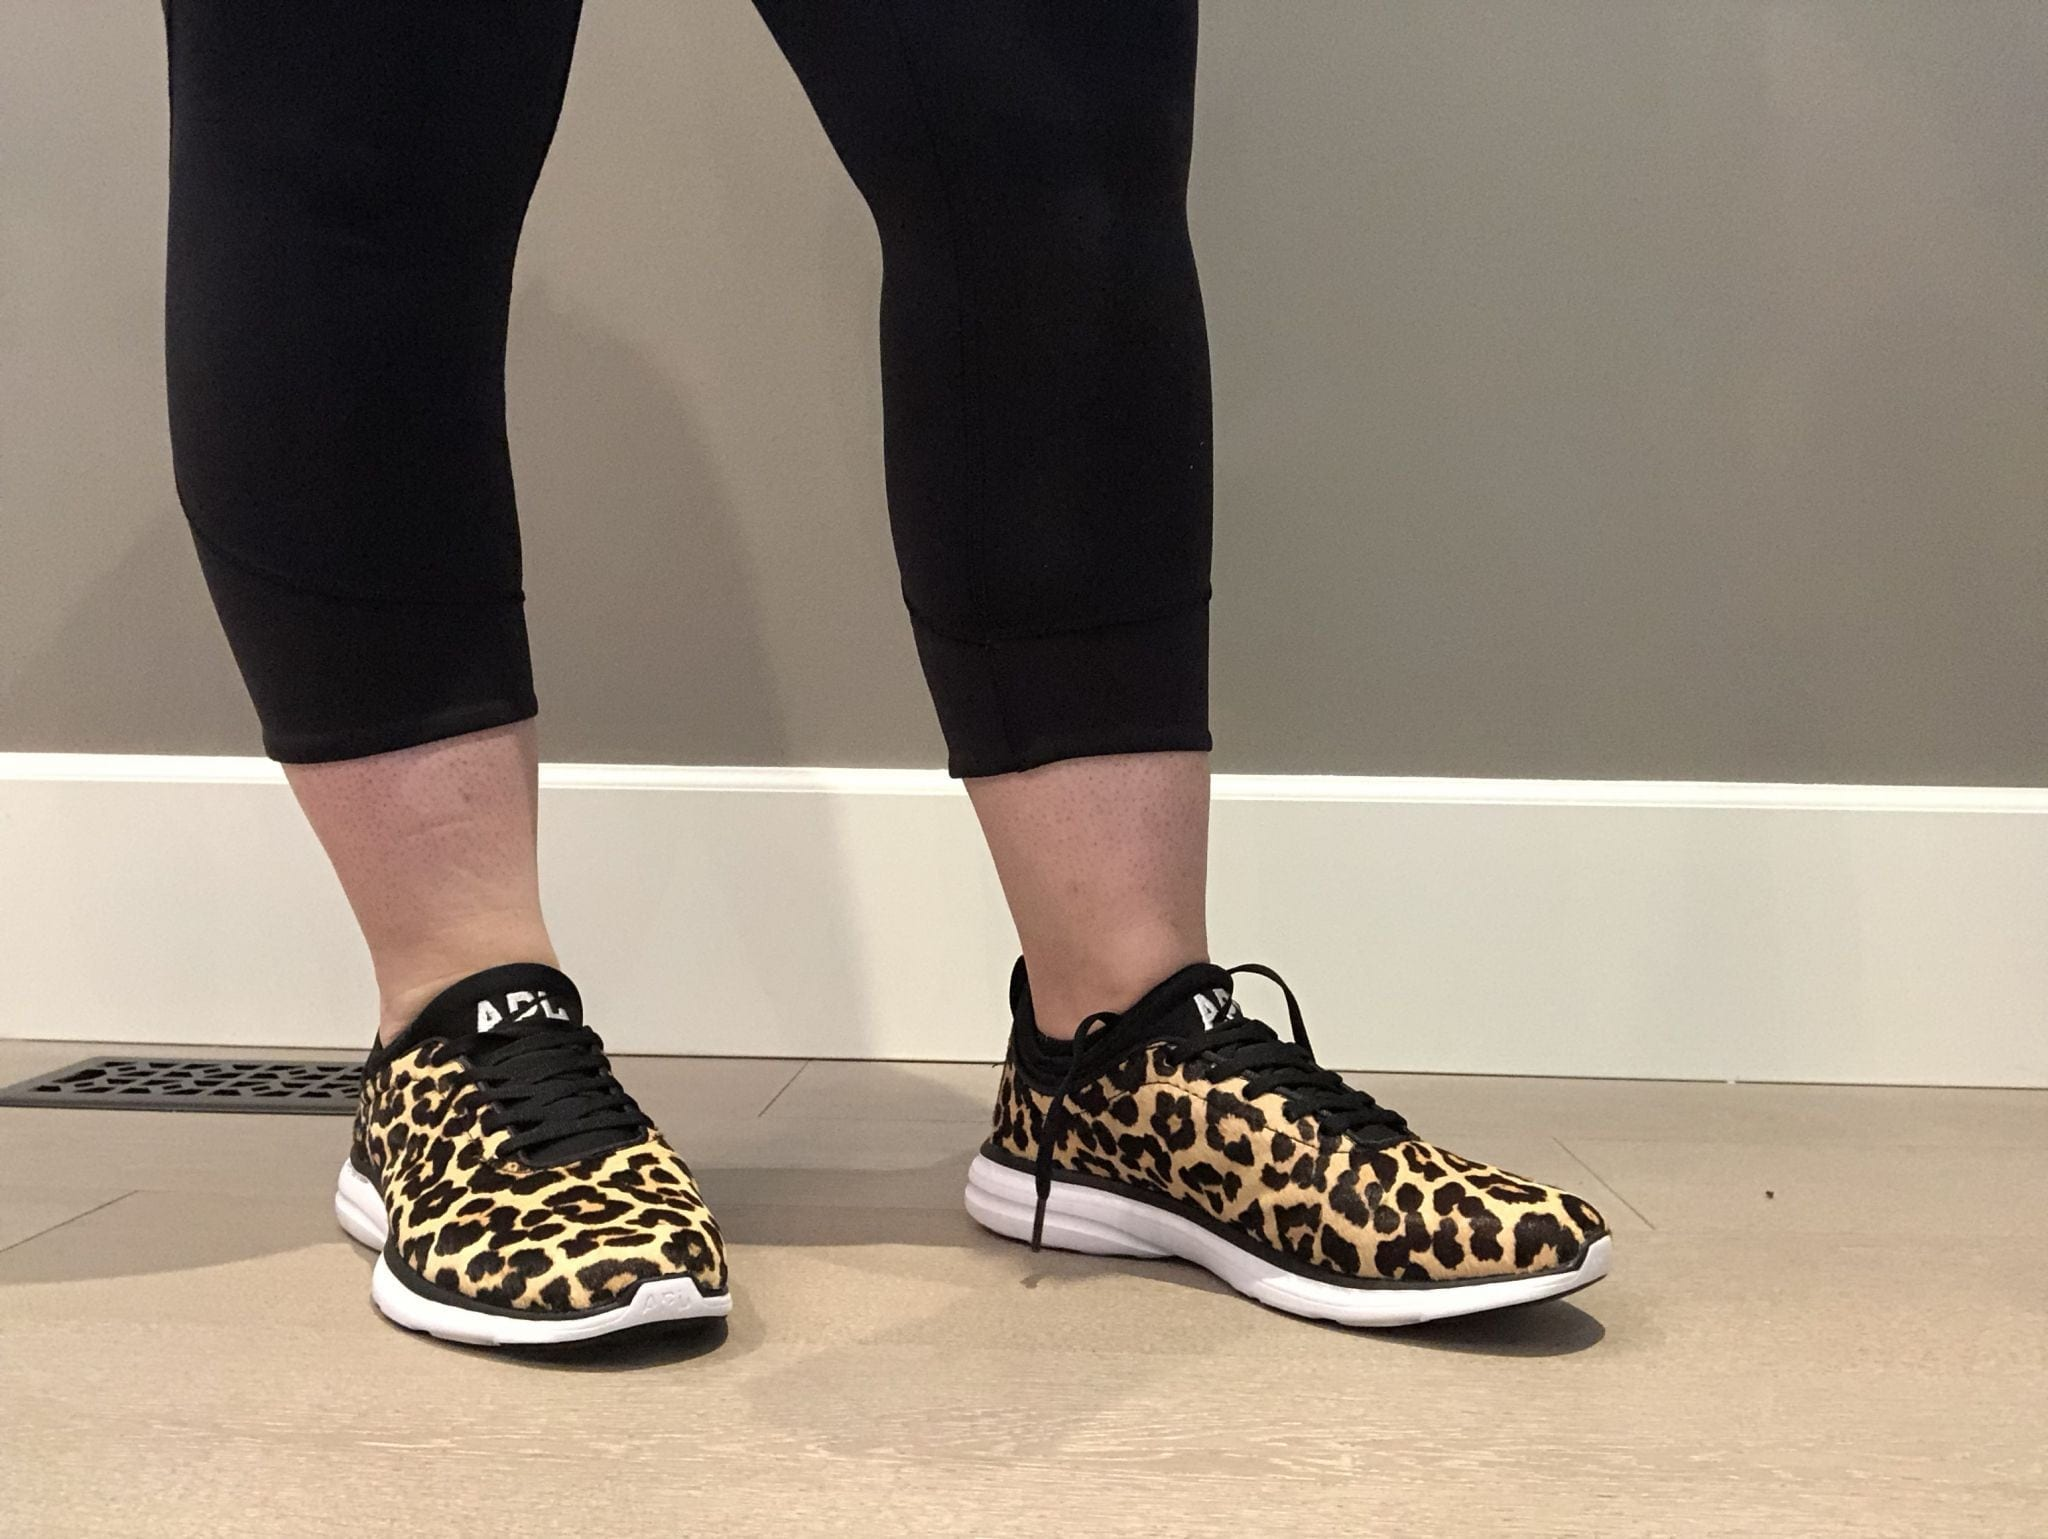 Athletic Propulsion Labs Phantom Leopard Black White Sneakers Calf Hair